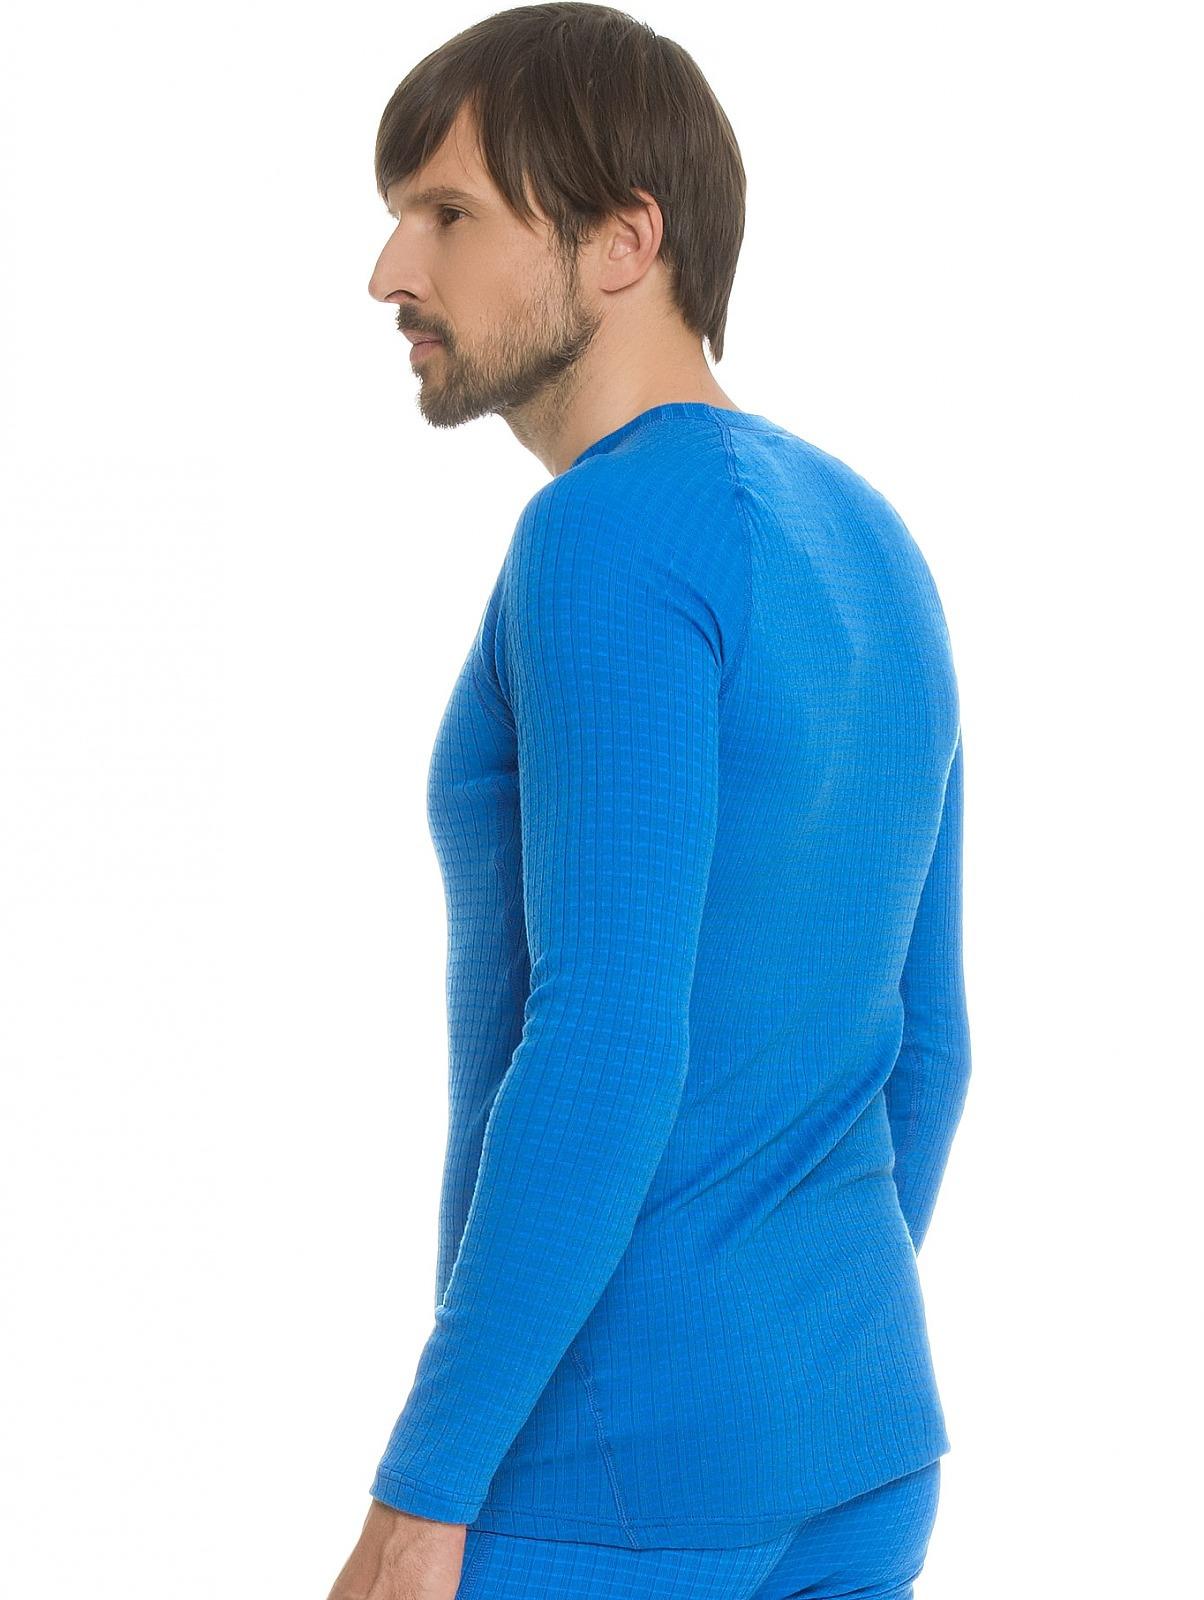 Мужской комплект термобелья крафт Warm Wool Blue (1903727-1336-1903726-1336)